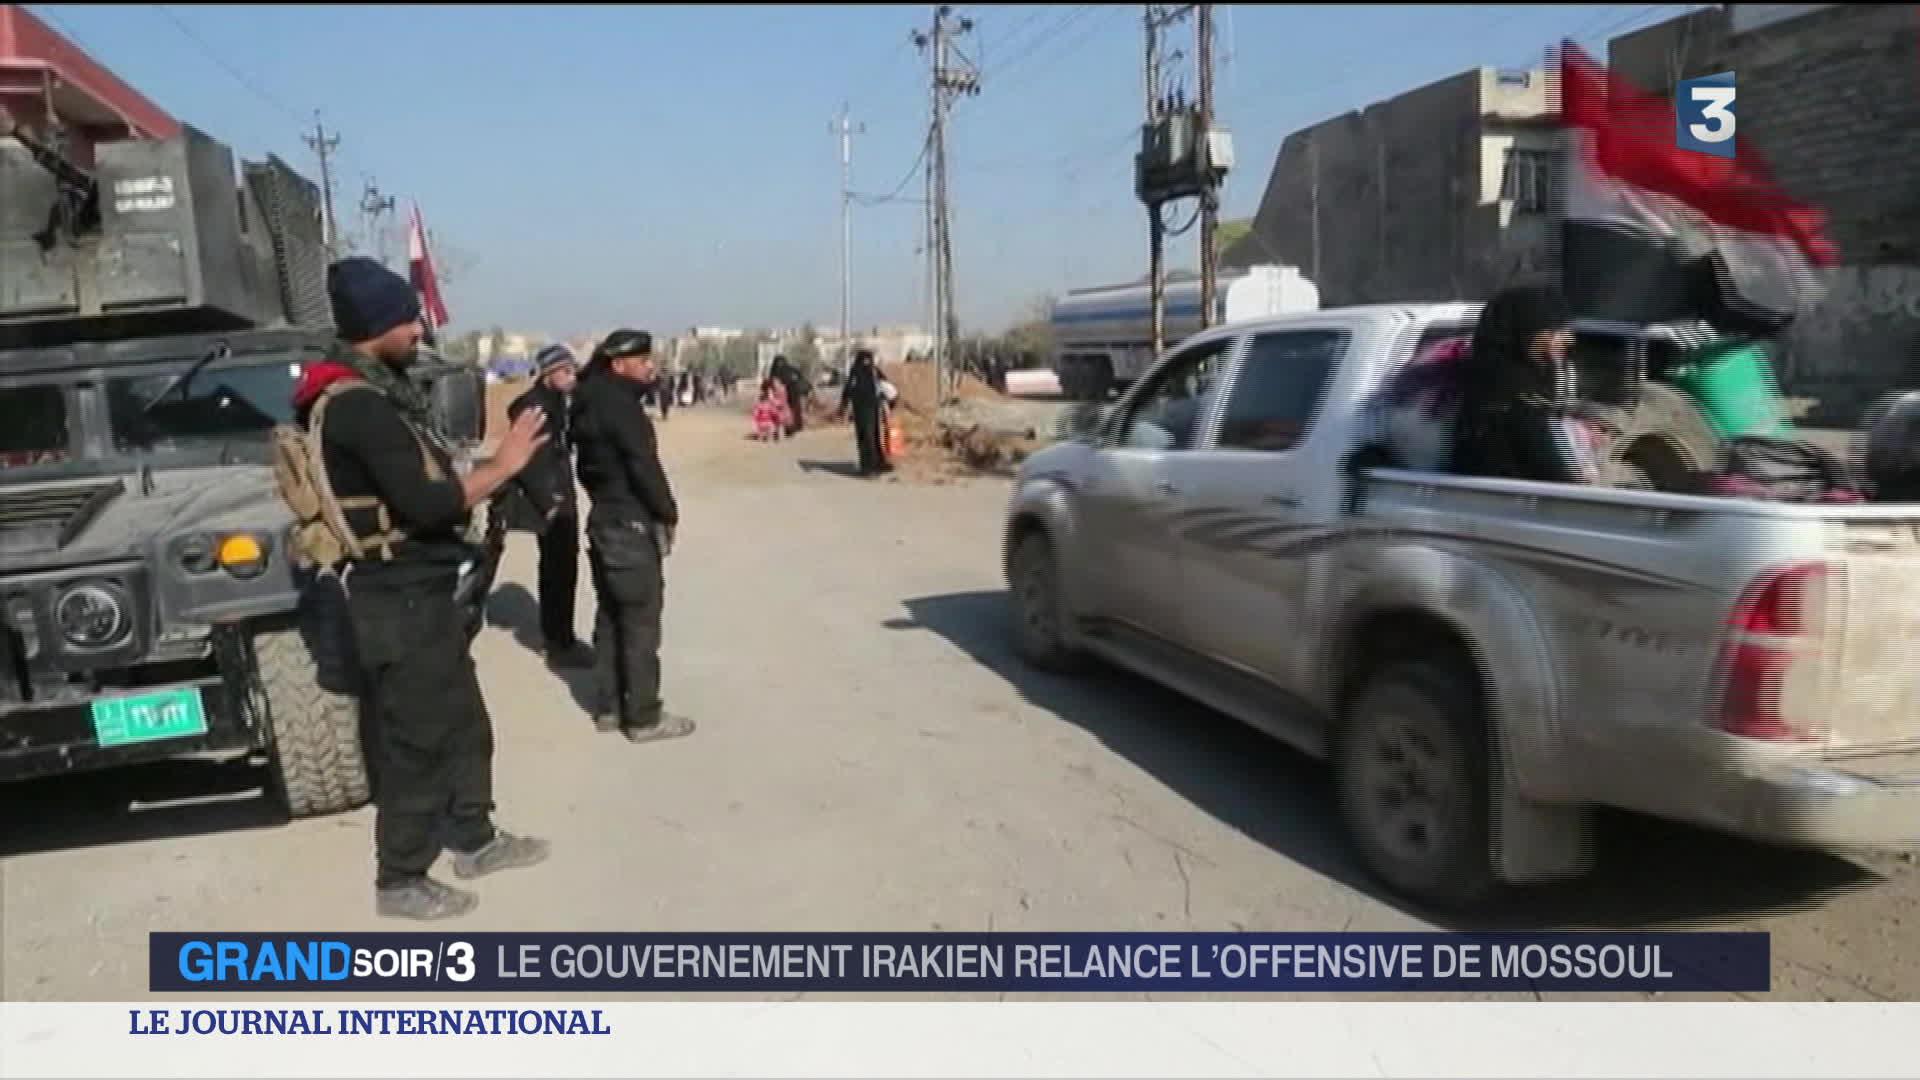 Irak : la relance de l'offensive de Mossoul